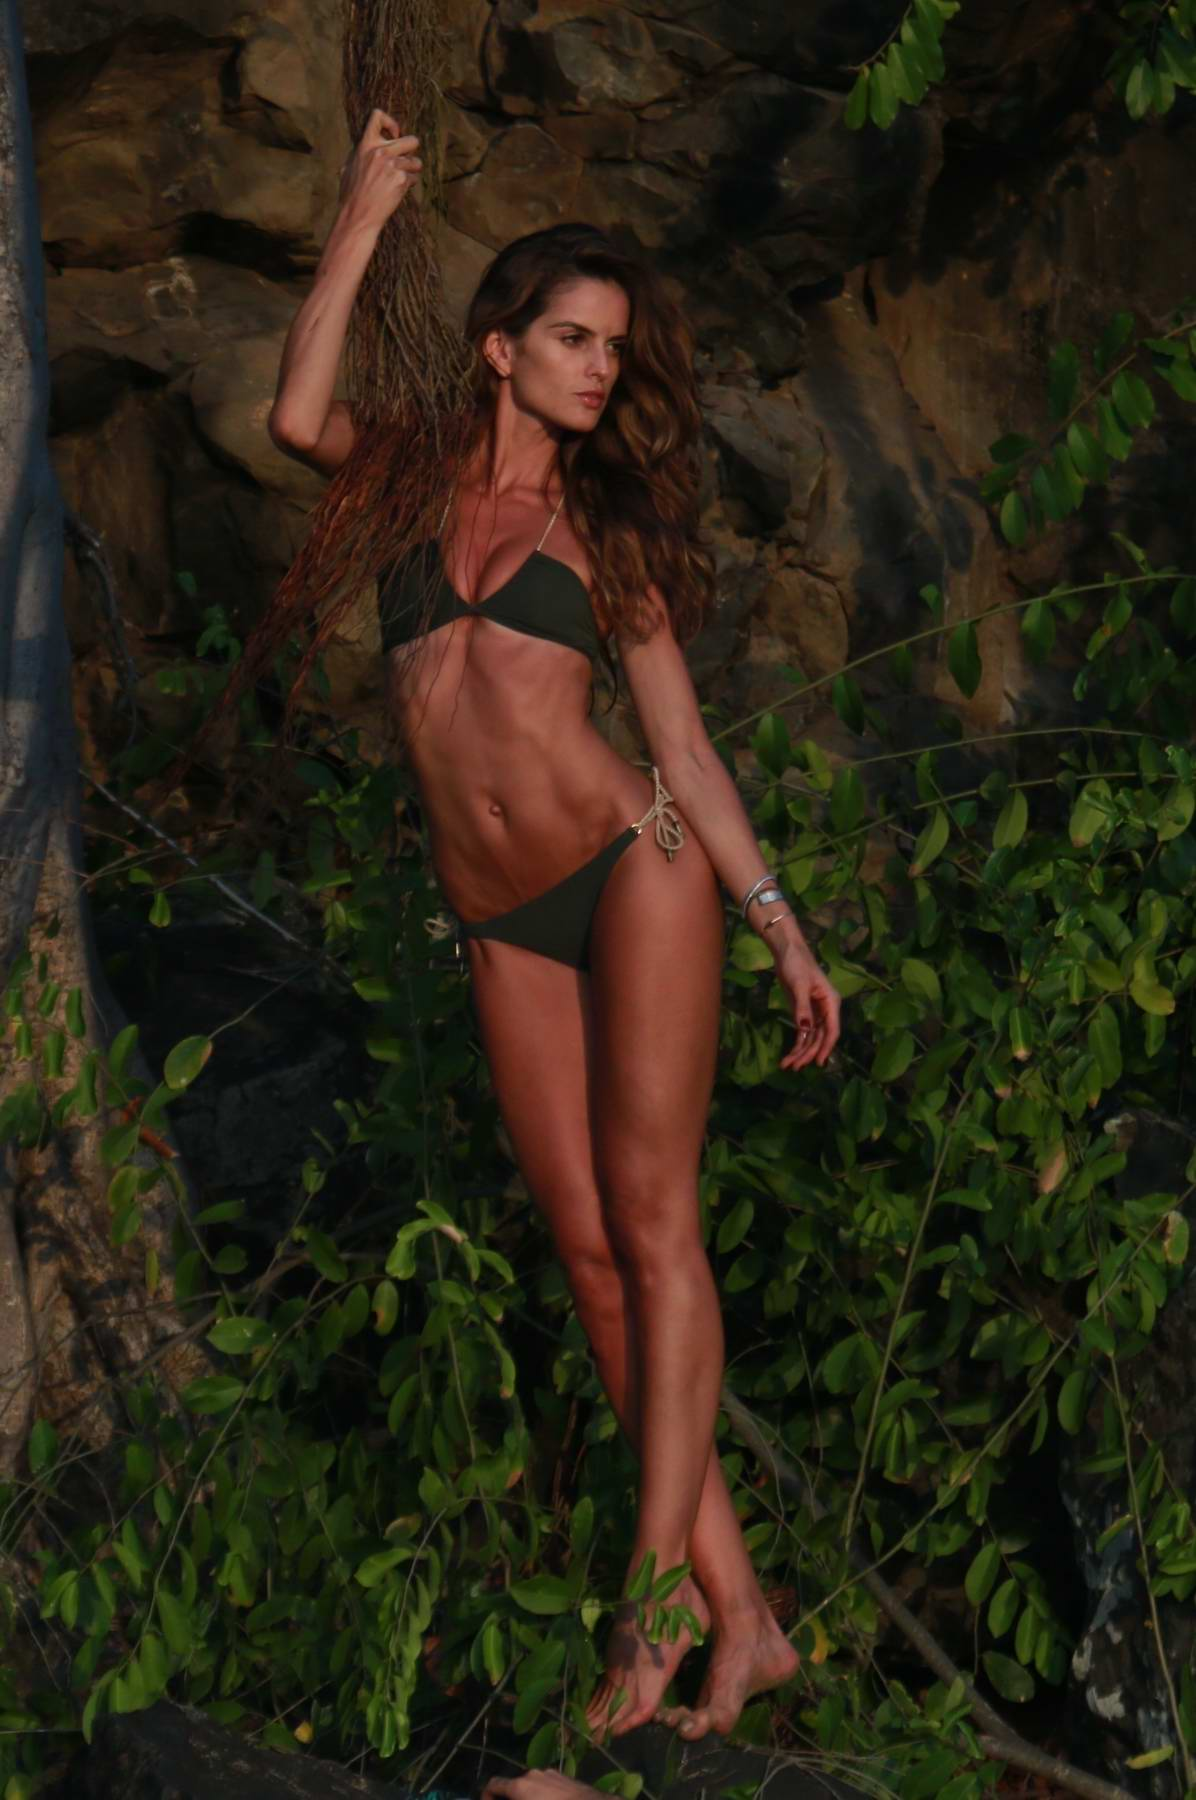 Izabel Goulart poses for a photoshoot in a green bikini at Fernando de Noronha, Brazil